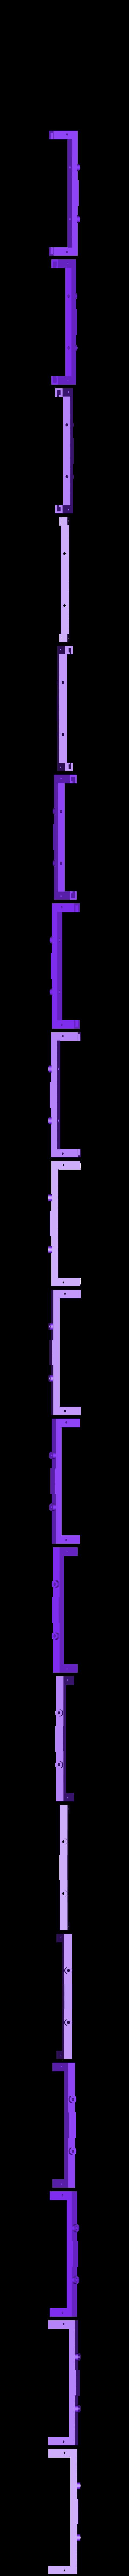 spu34rear cross.stl Download STL file 34' Ford Pickup Hot Rod • 3D printing object, macone1